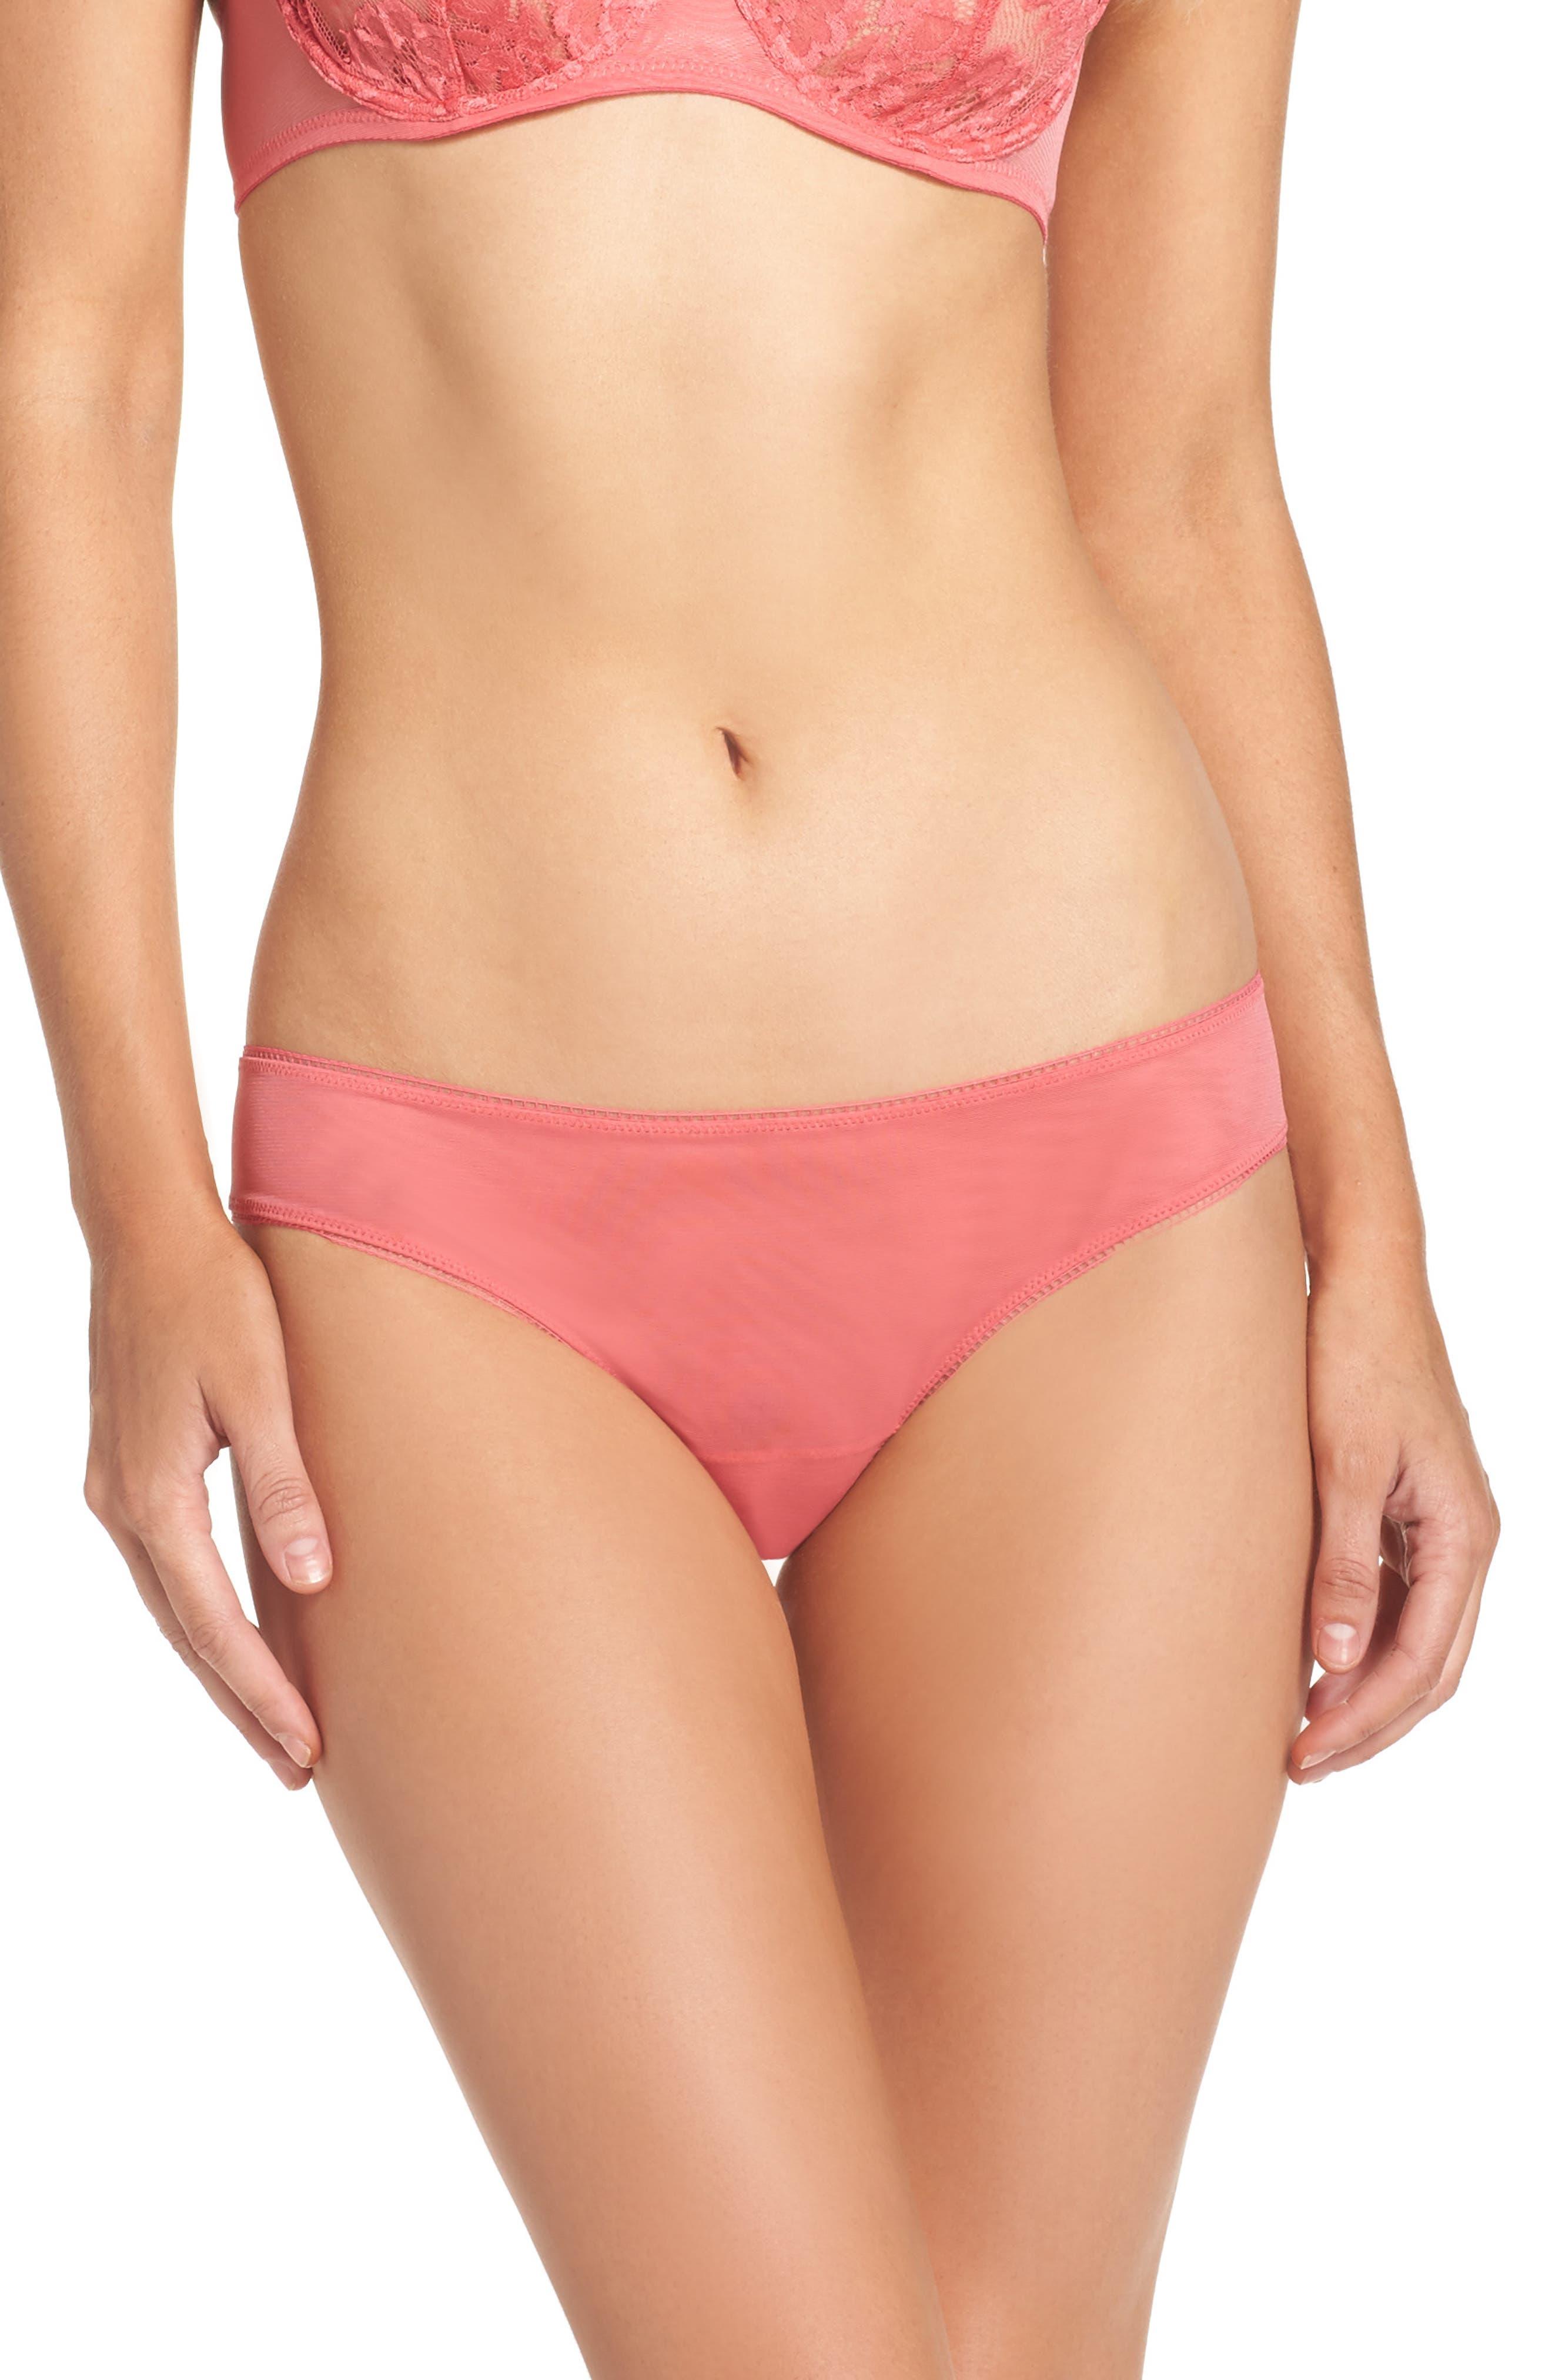 Alternate Image 1 Selected - La Perla Primrose Field Brazilian Panties